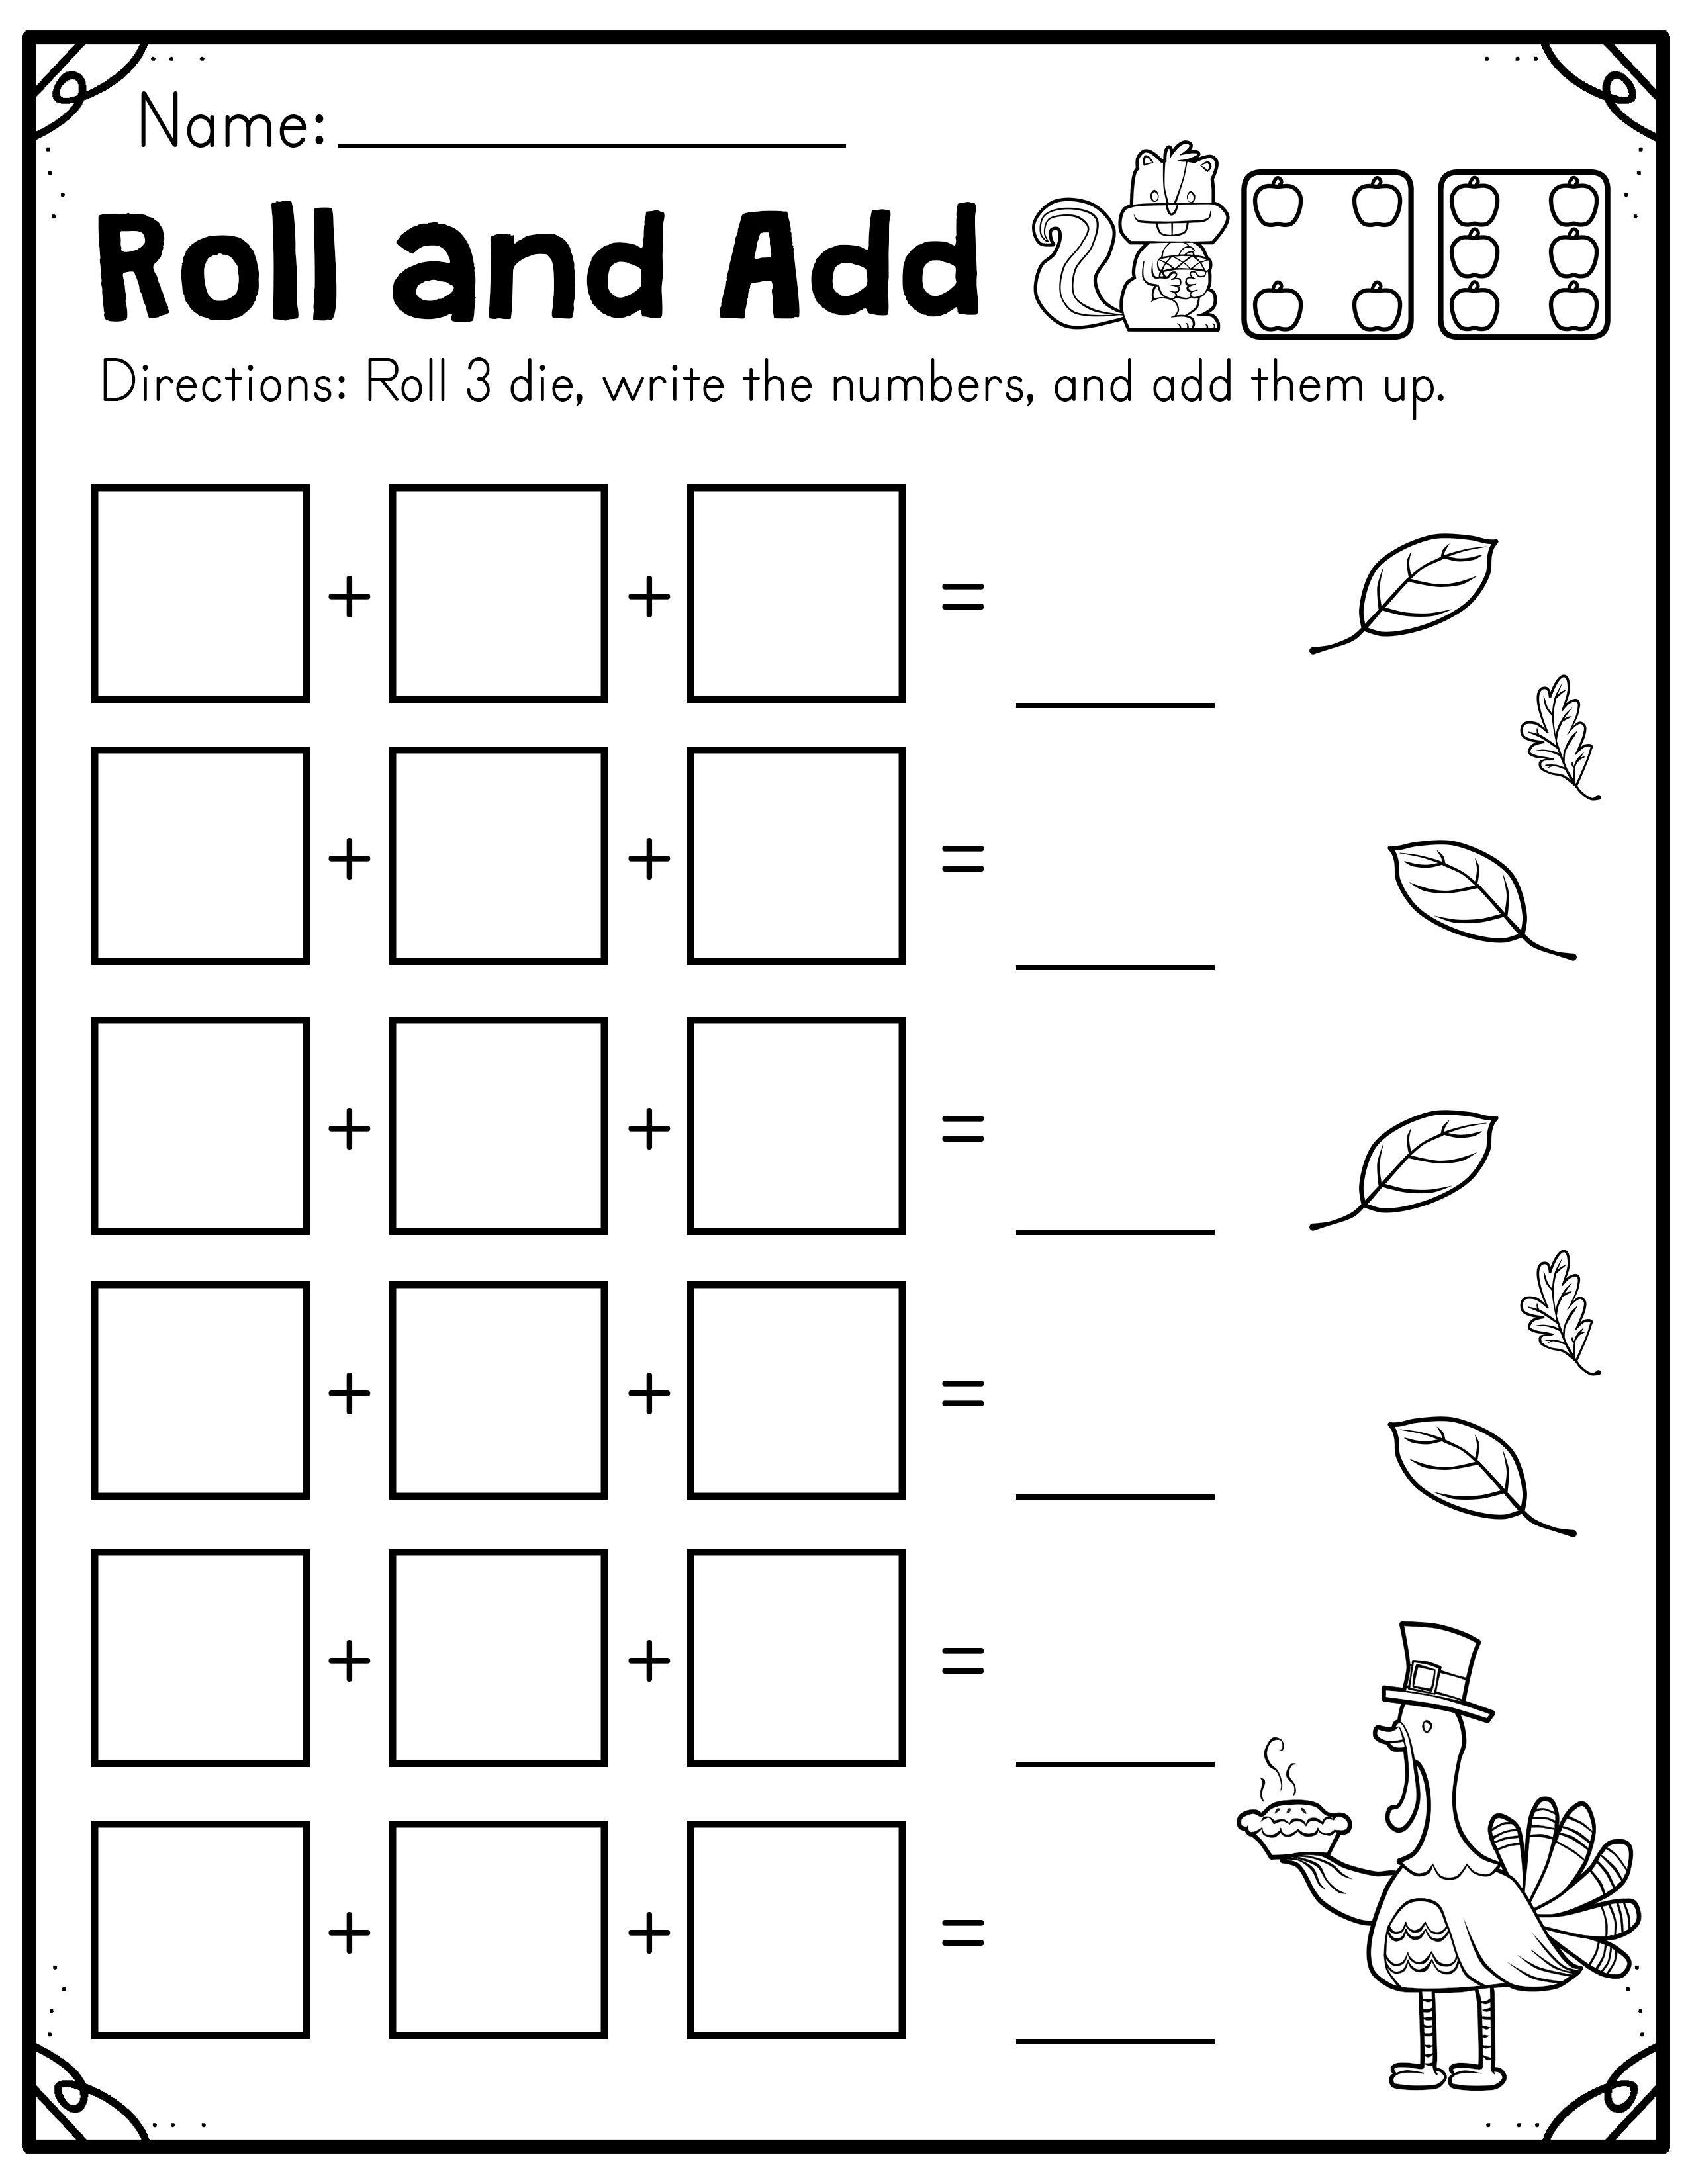 Fall Roll And Add Worksheet First Grade Made By Teachers Kindergarten Math Worksheets Free First Grade Math Worksheets Kindergarten Math Worksheets Addition 1st grade math worksheets adding and